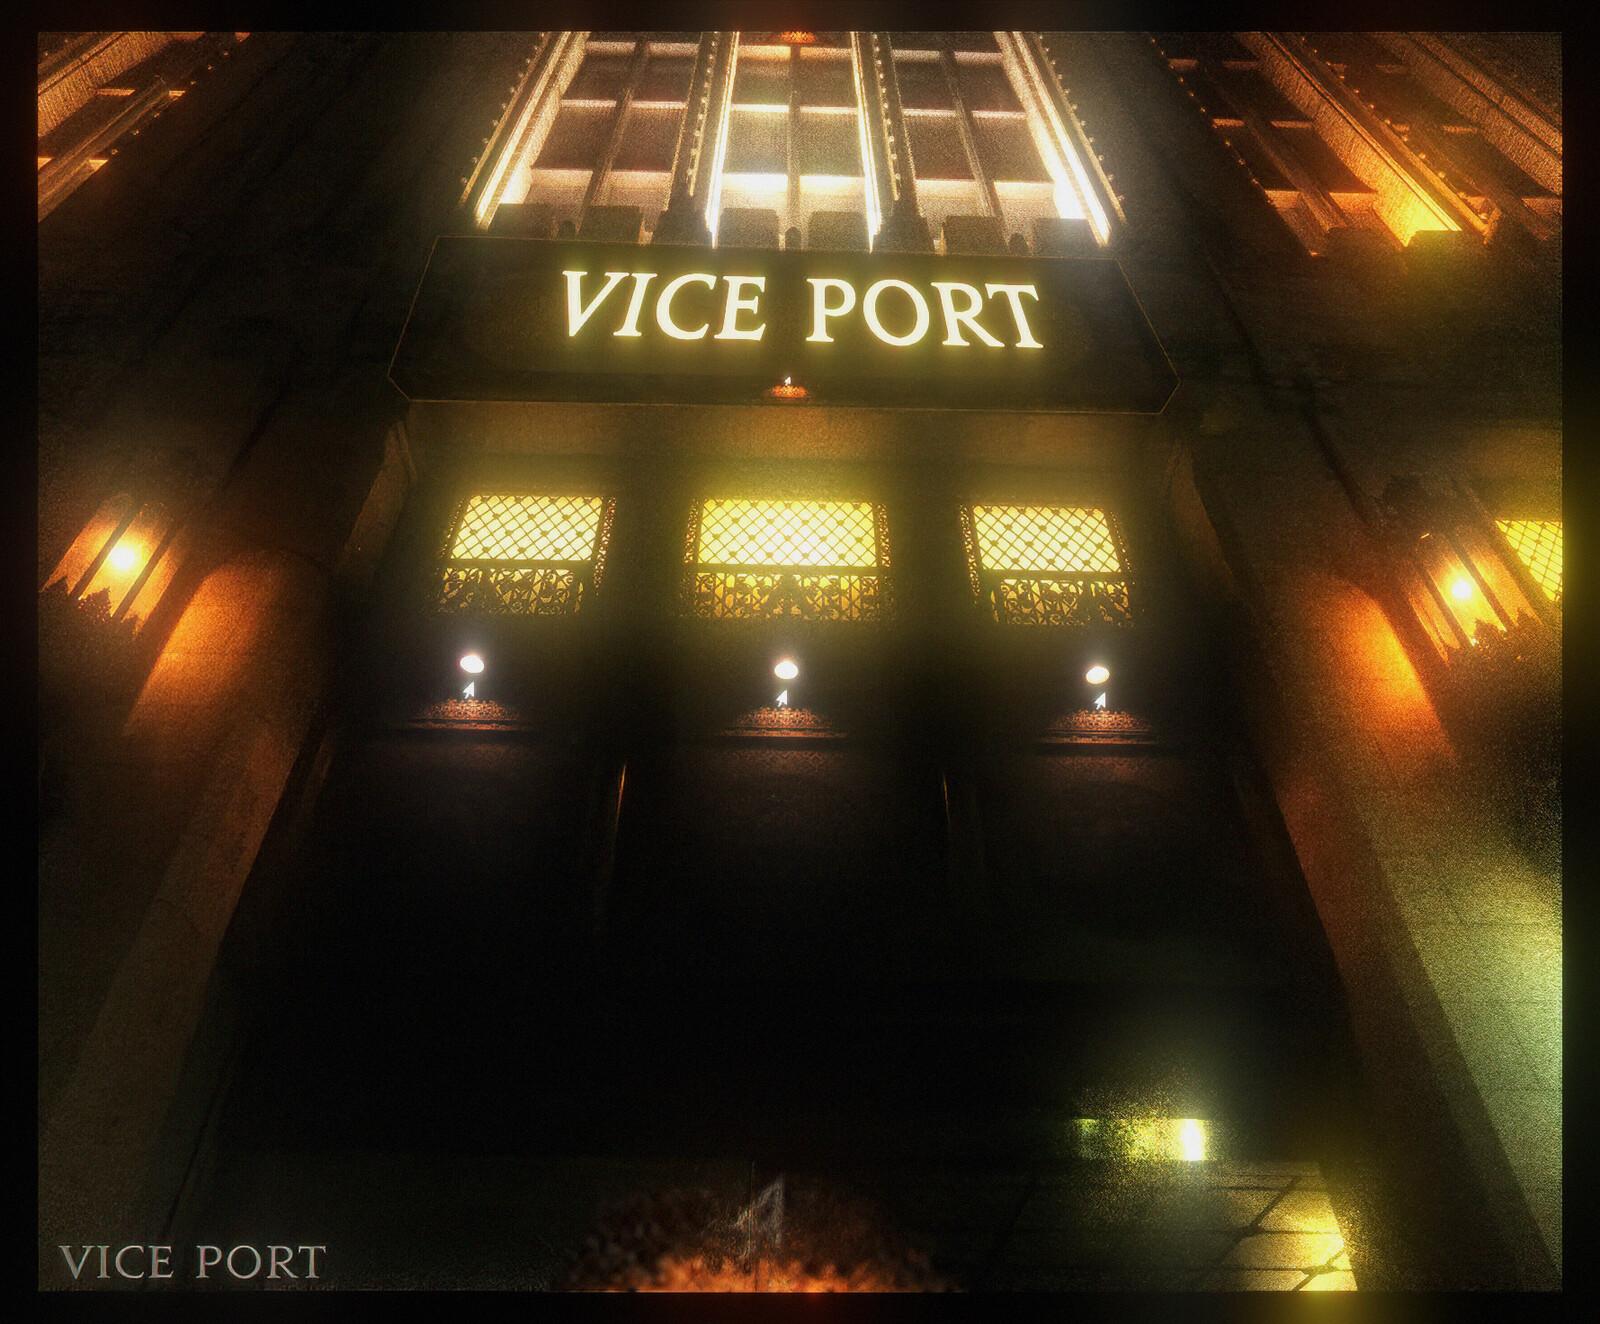 VICE PORT